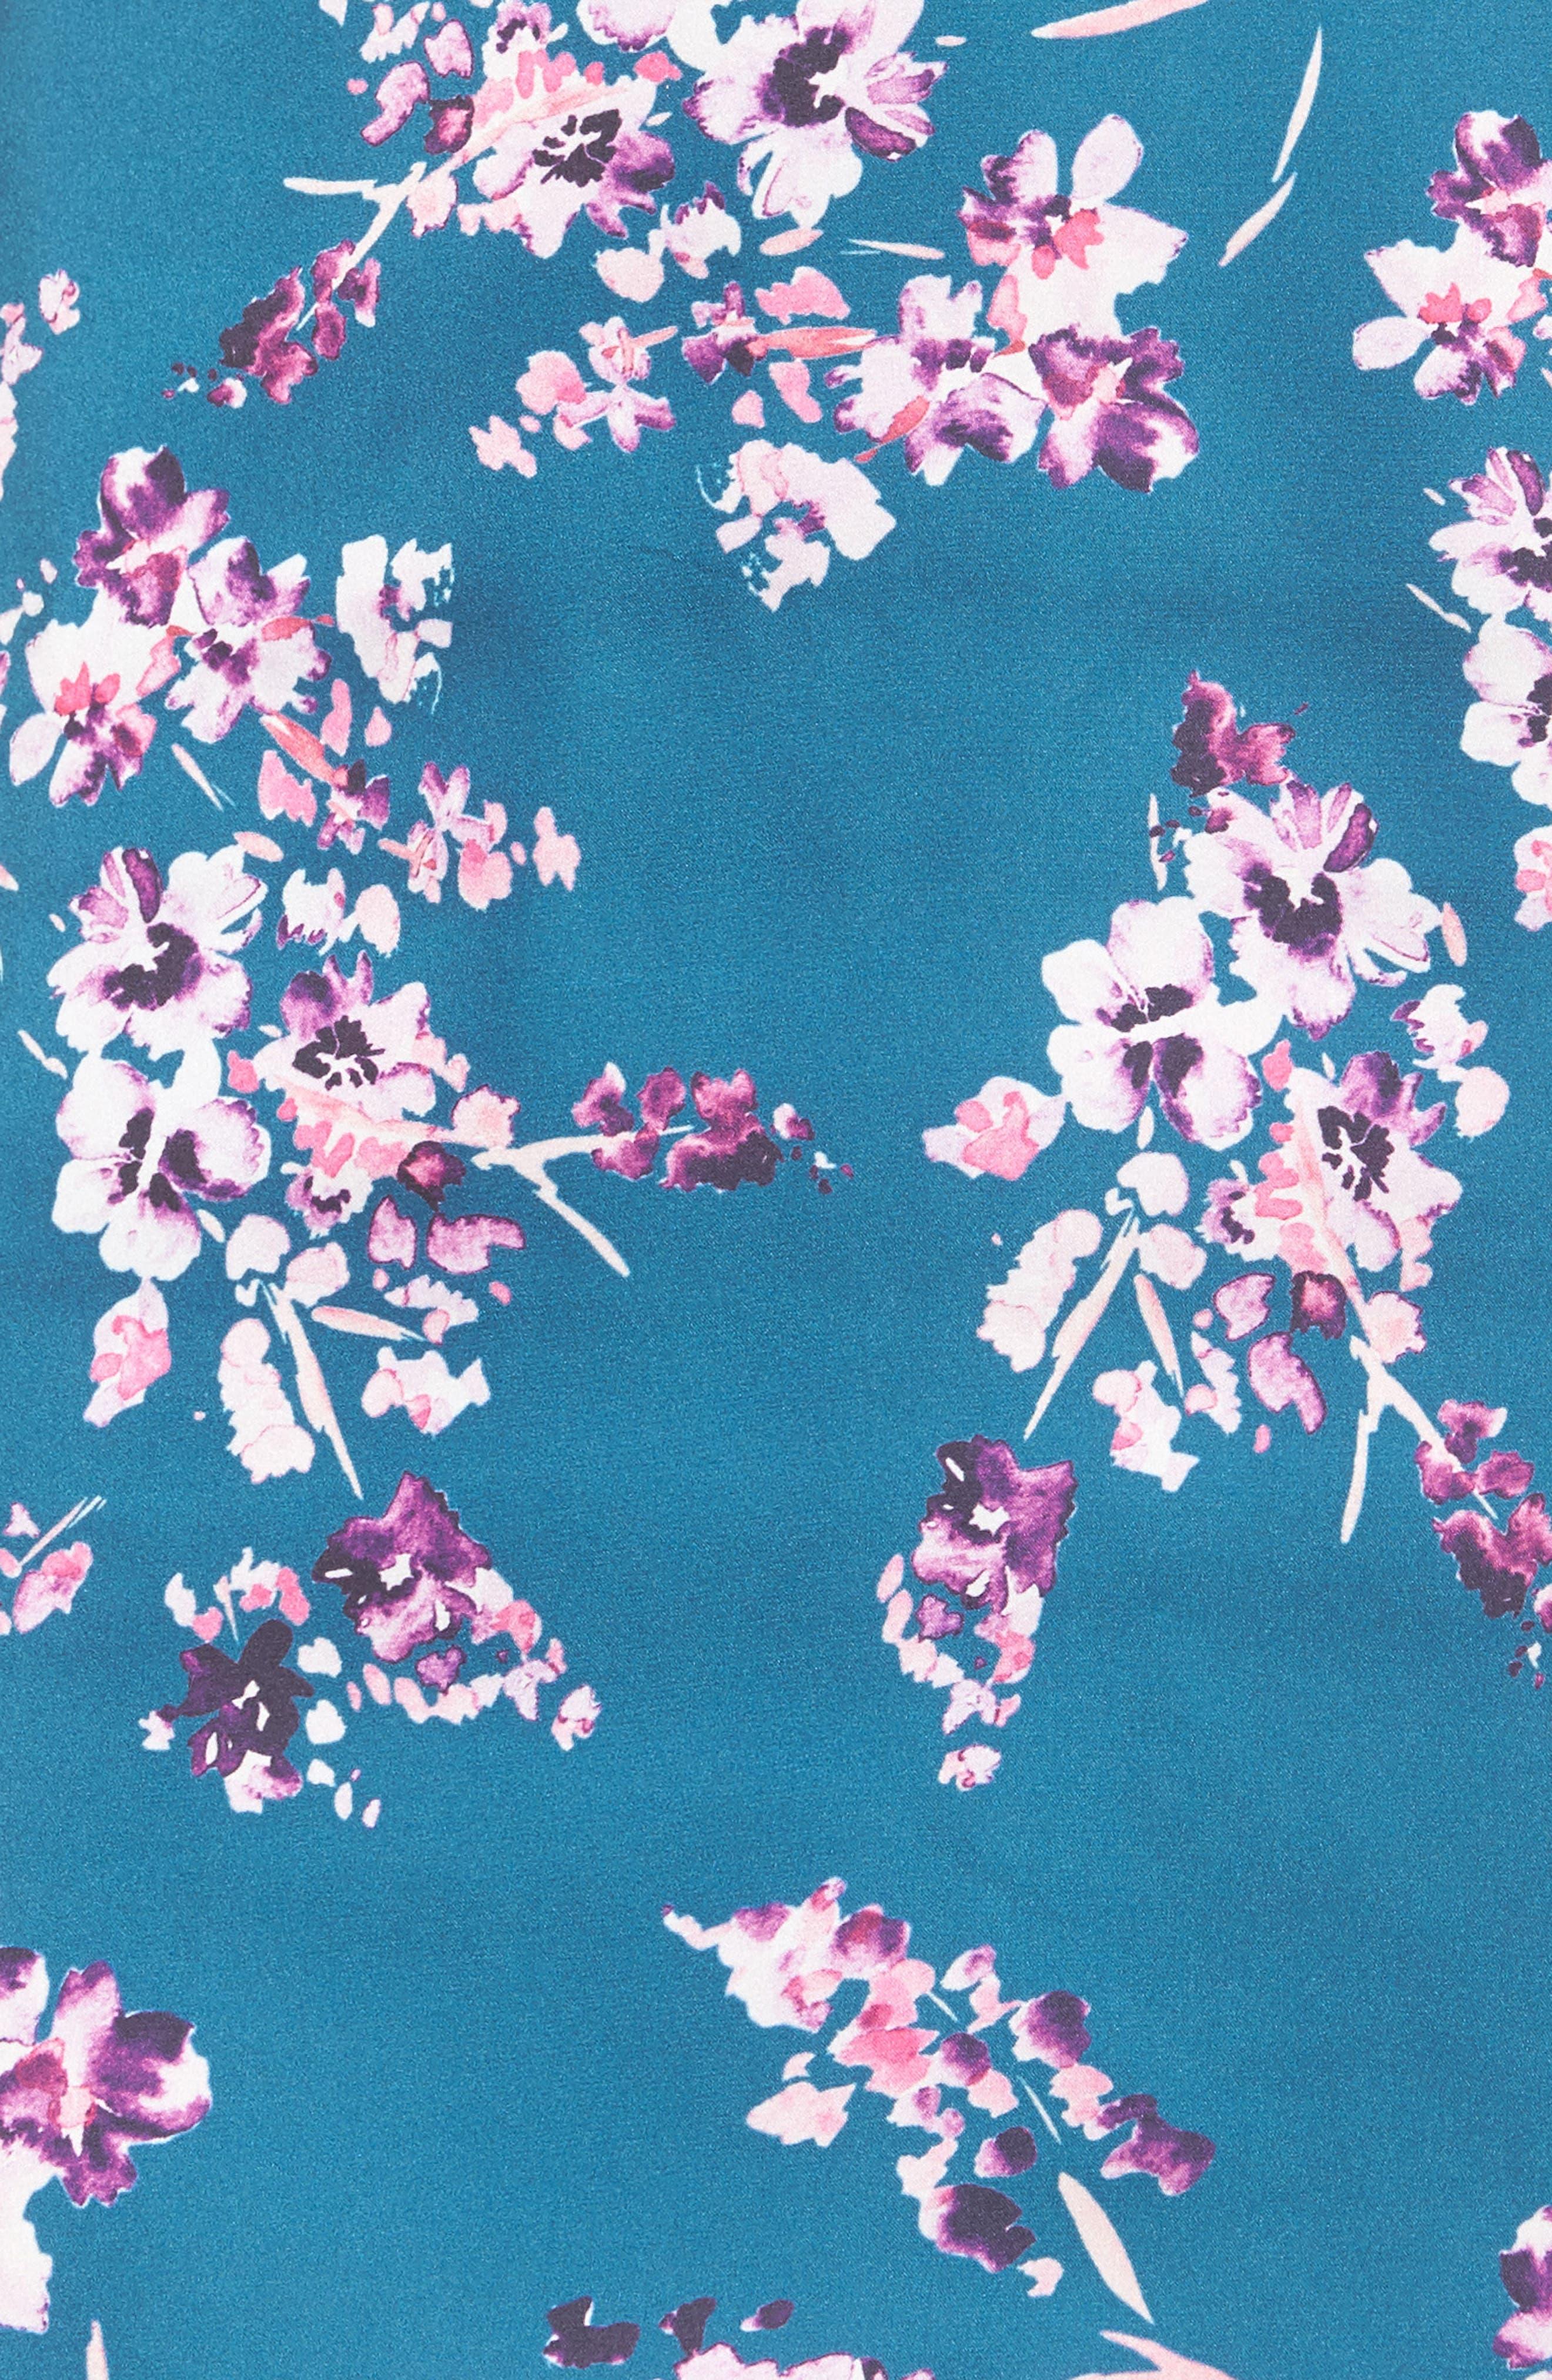 Clover Cold Shoulder Sheath Dress,                             Alternate thumbnail 5, color,                             Moroccan Blossom